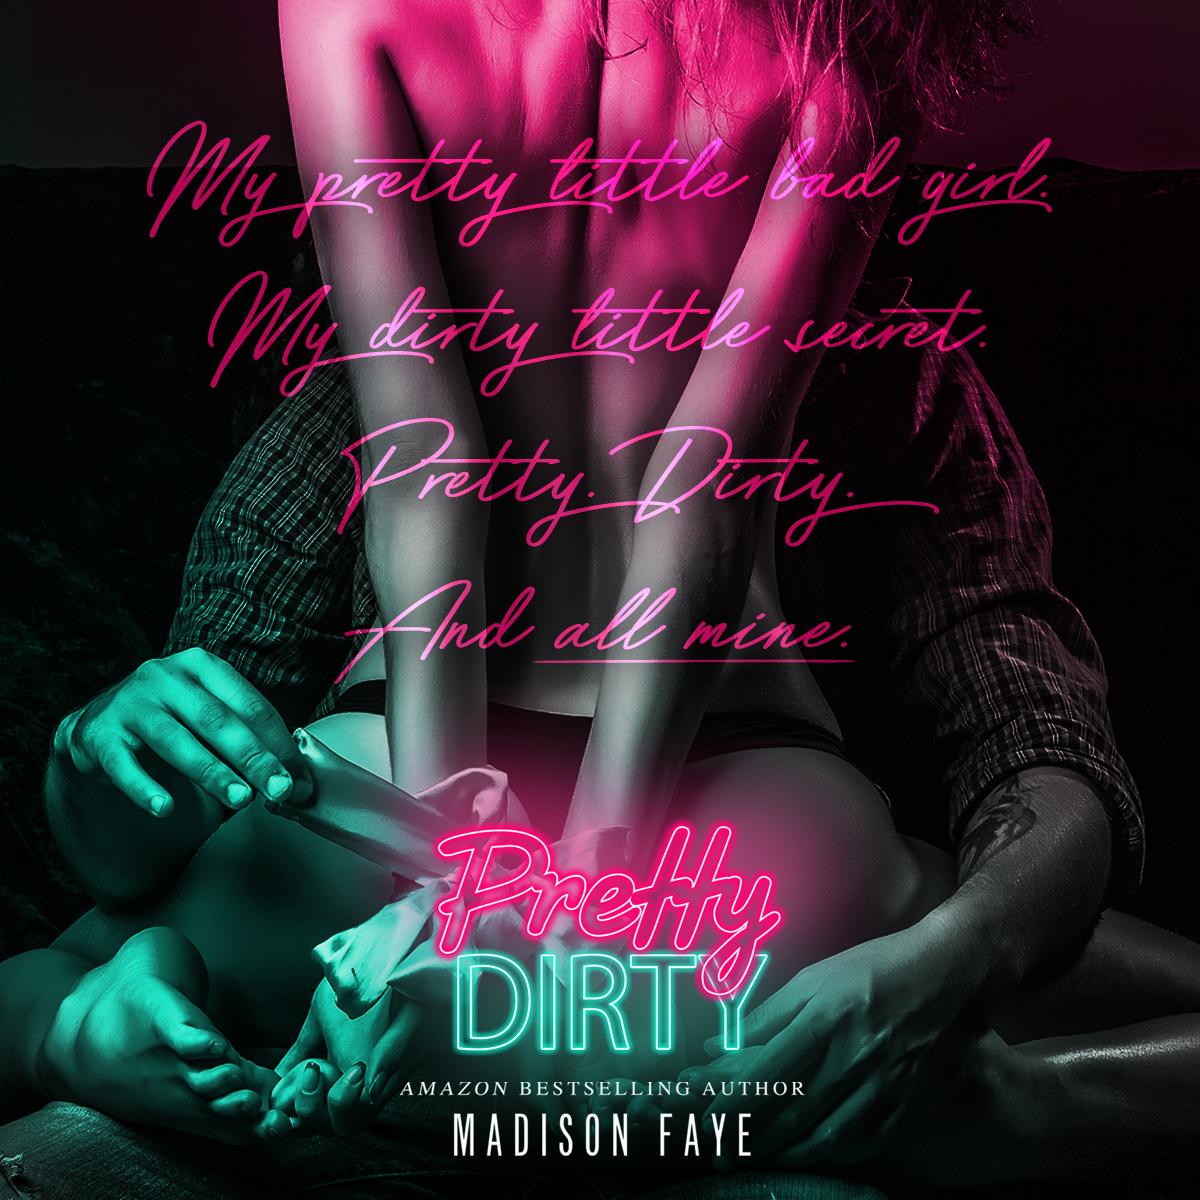 3fbc12eabd2e Pretty Dirty by Madison Faye